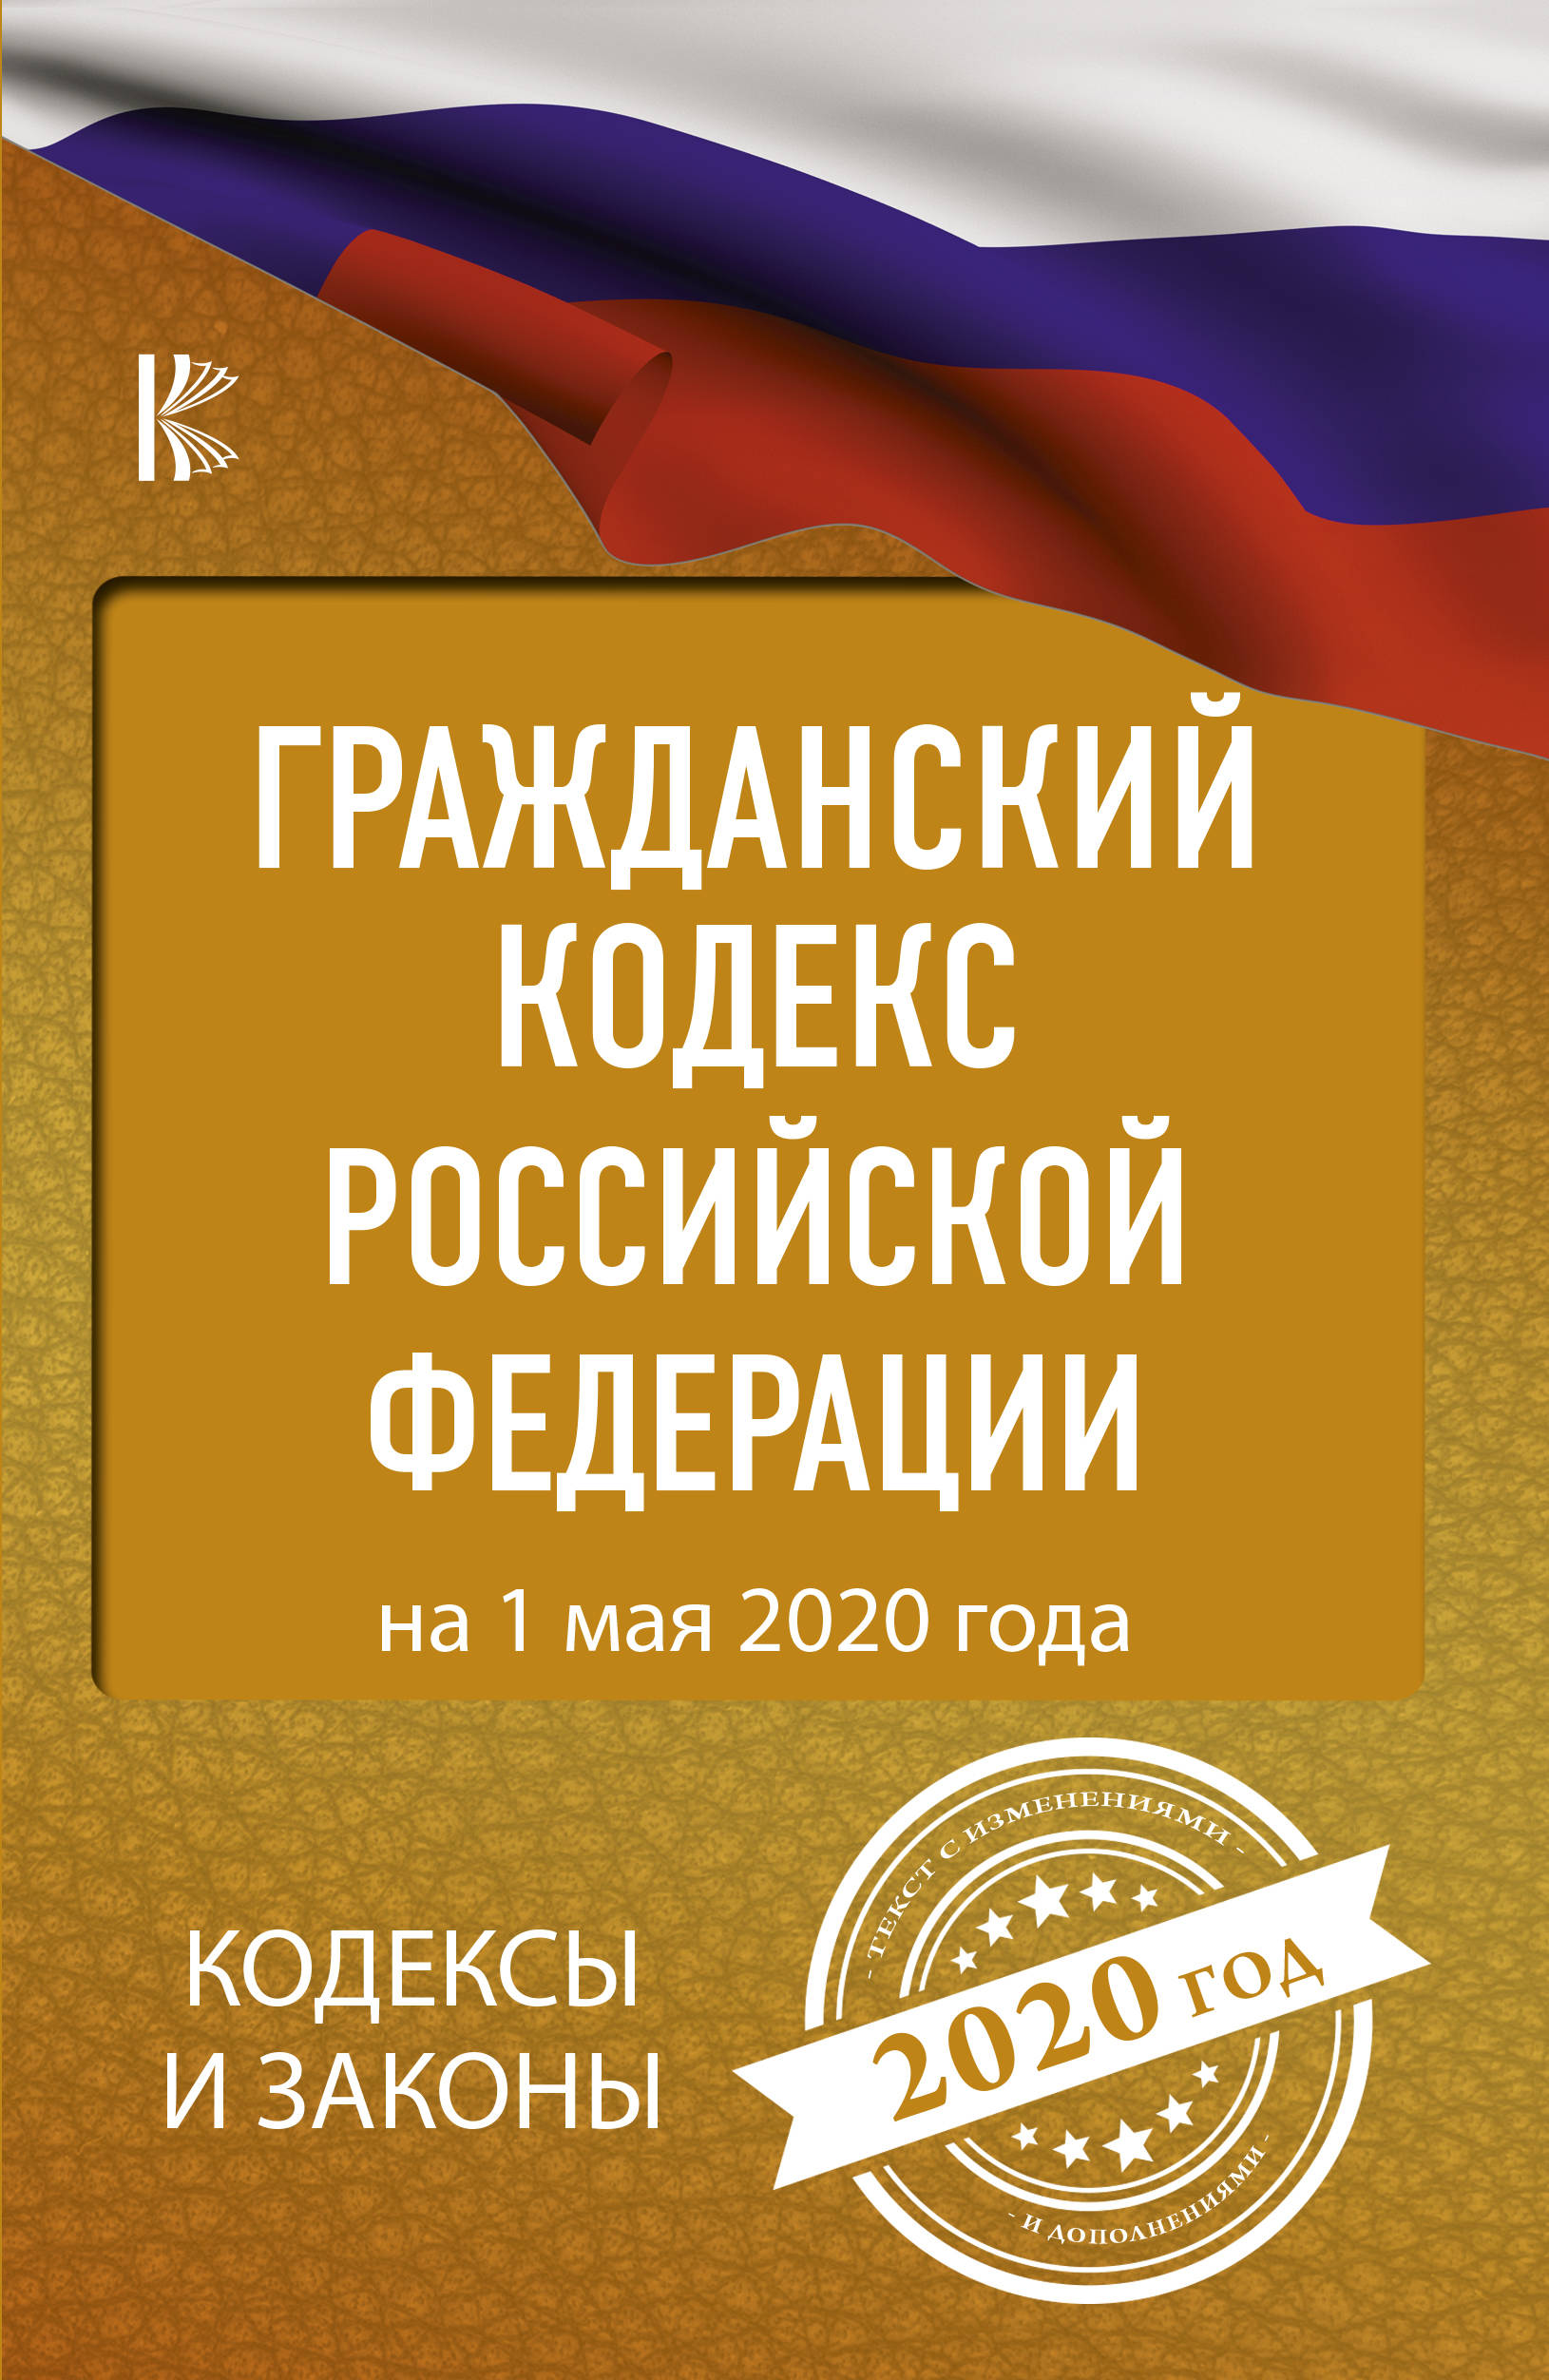 Grazhdanskij Kodeks Rossijskoj Federatsii na 1 maja 2020 goda